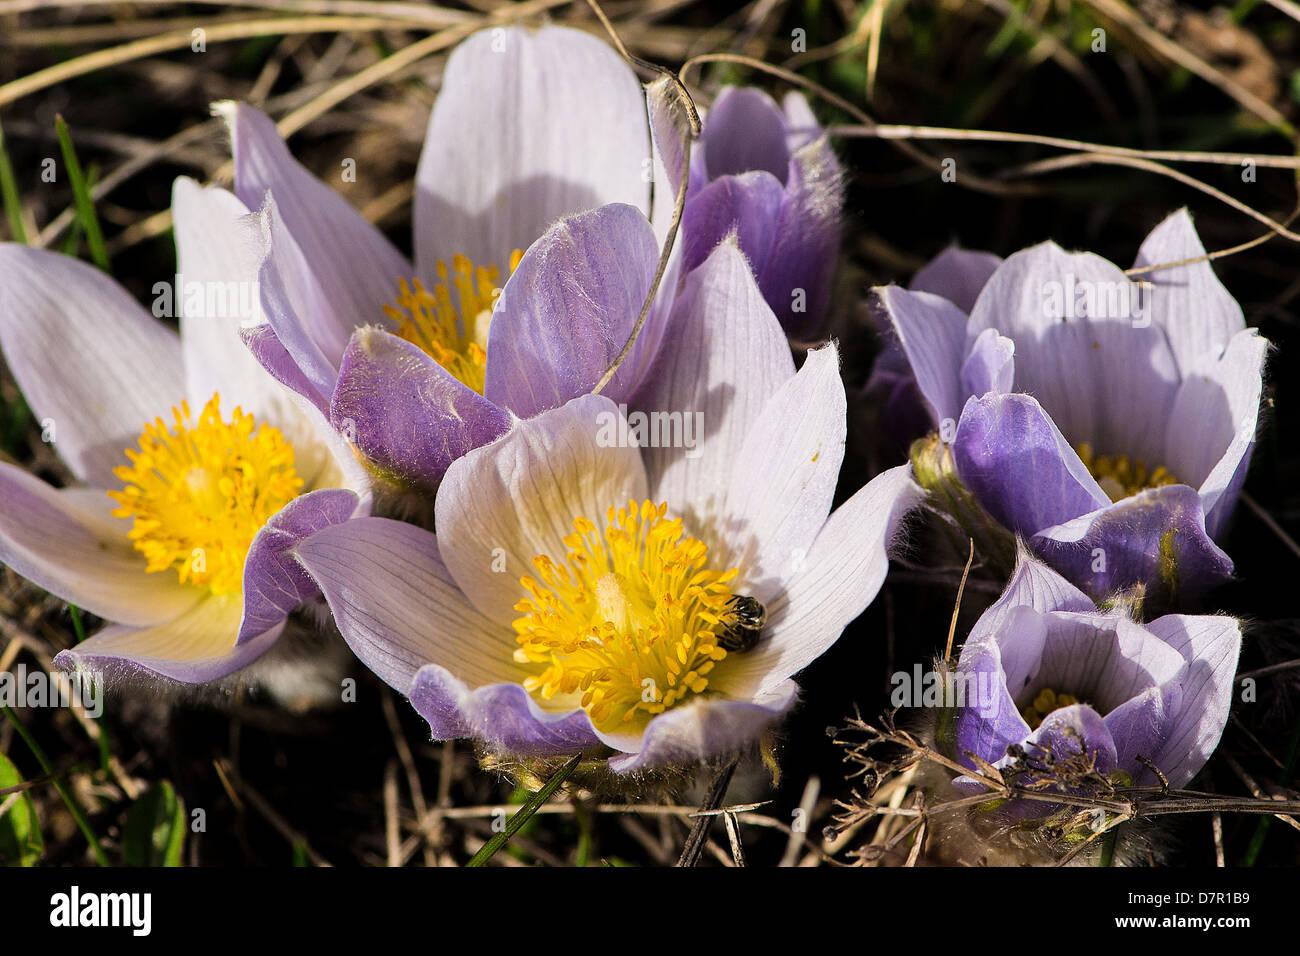 Crocus (crocuses, croci) , iris family, perennials, corms Cyprus hills, Alberta - Stock Image